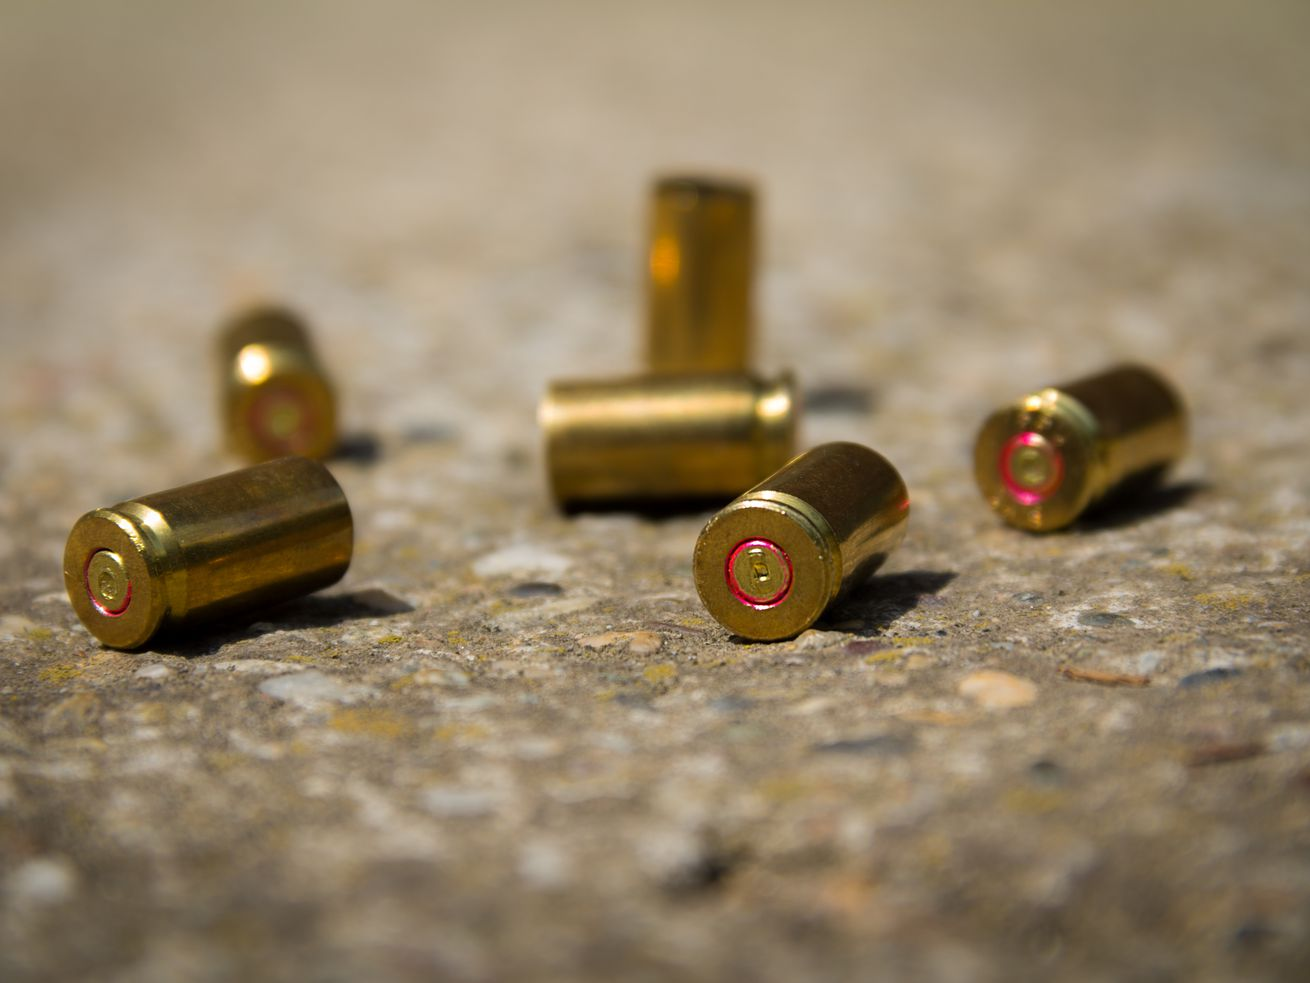 Man killed in Roseland shooting: police